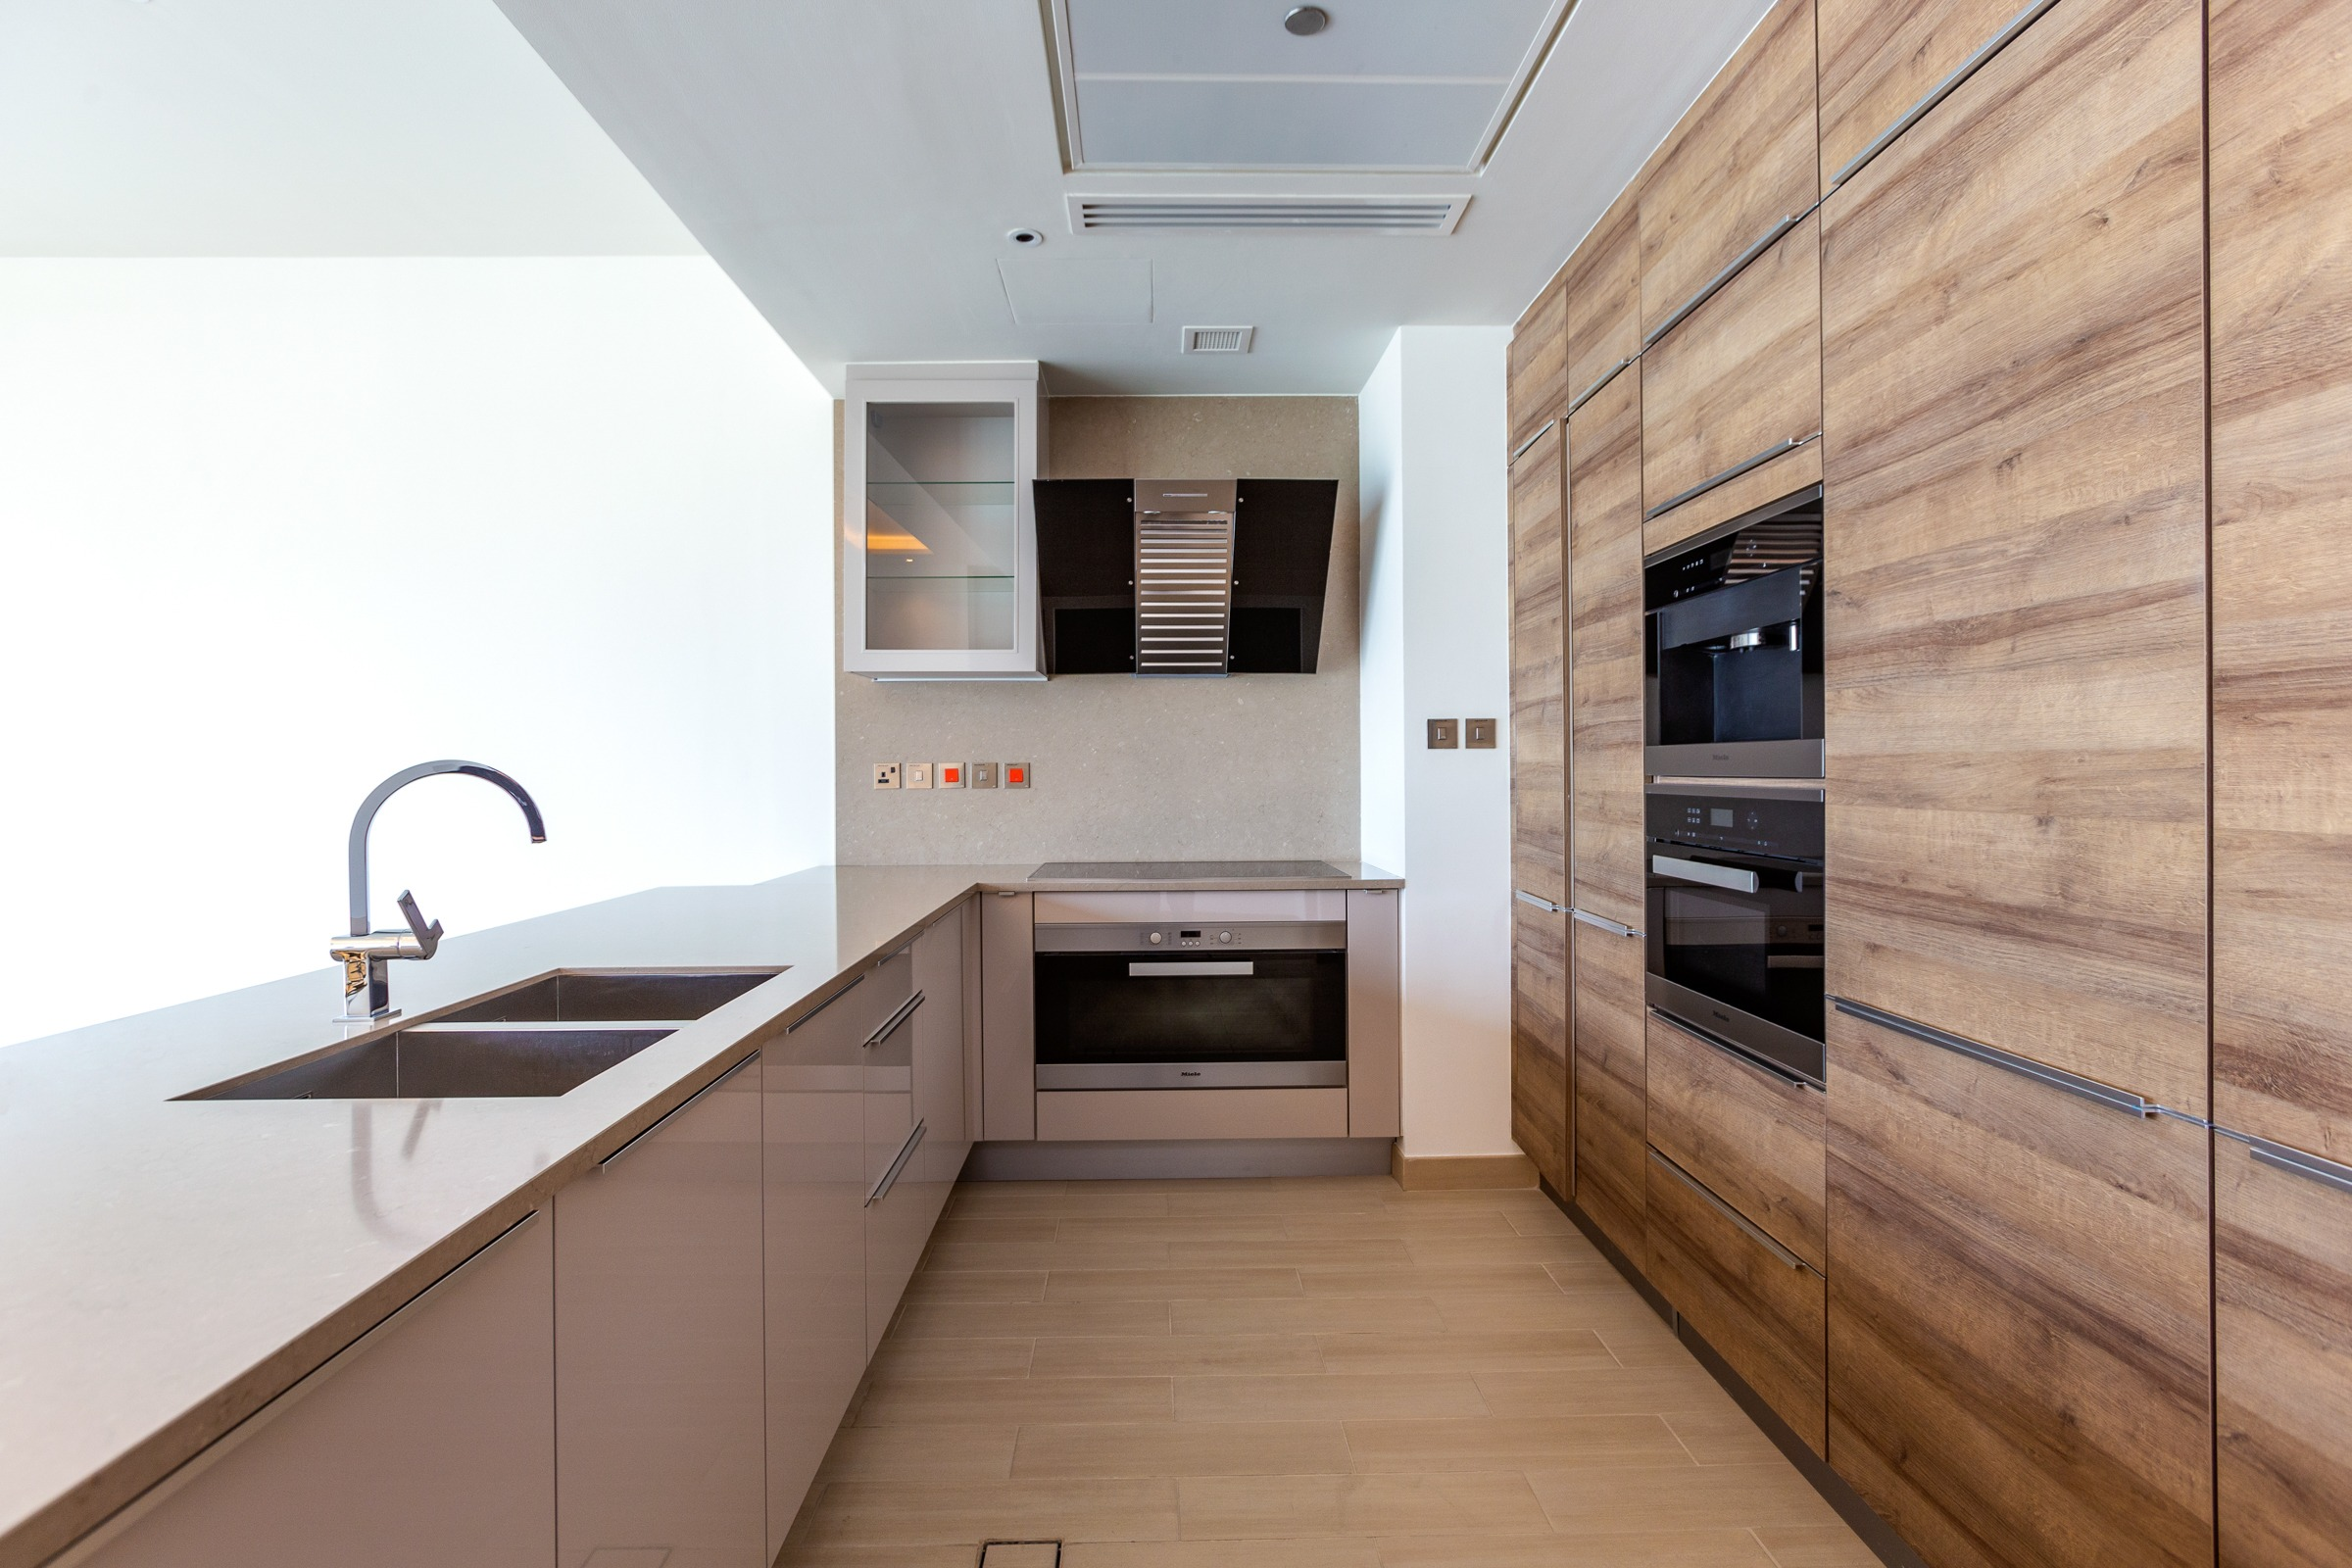 2 Bedroom Podium Villa with Full Marina